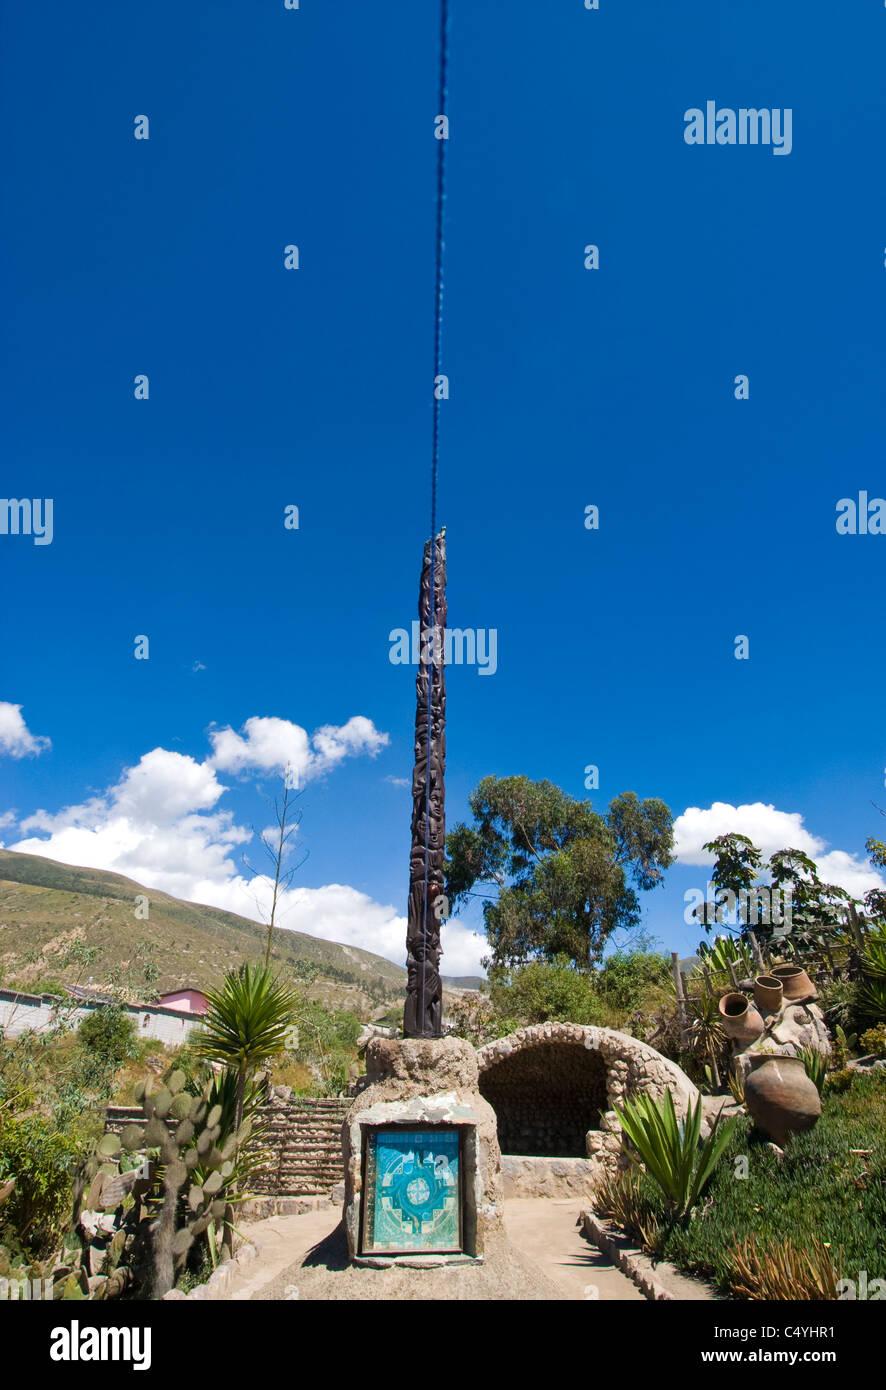 Equator monument near Quito Ecuador; vertical line is right over the equator - Stock Image